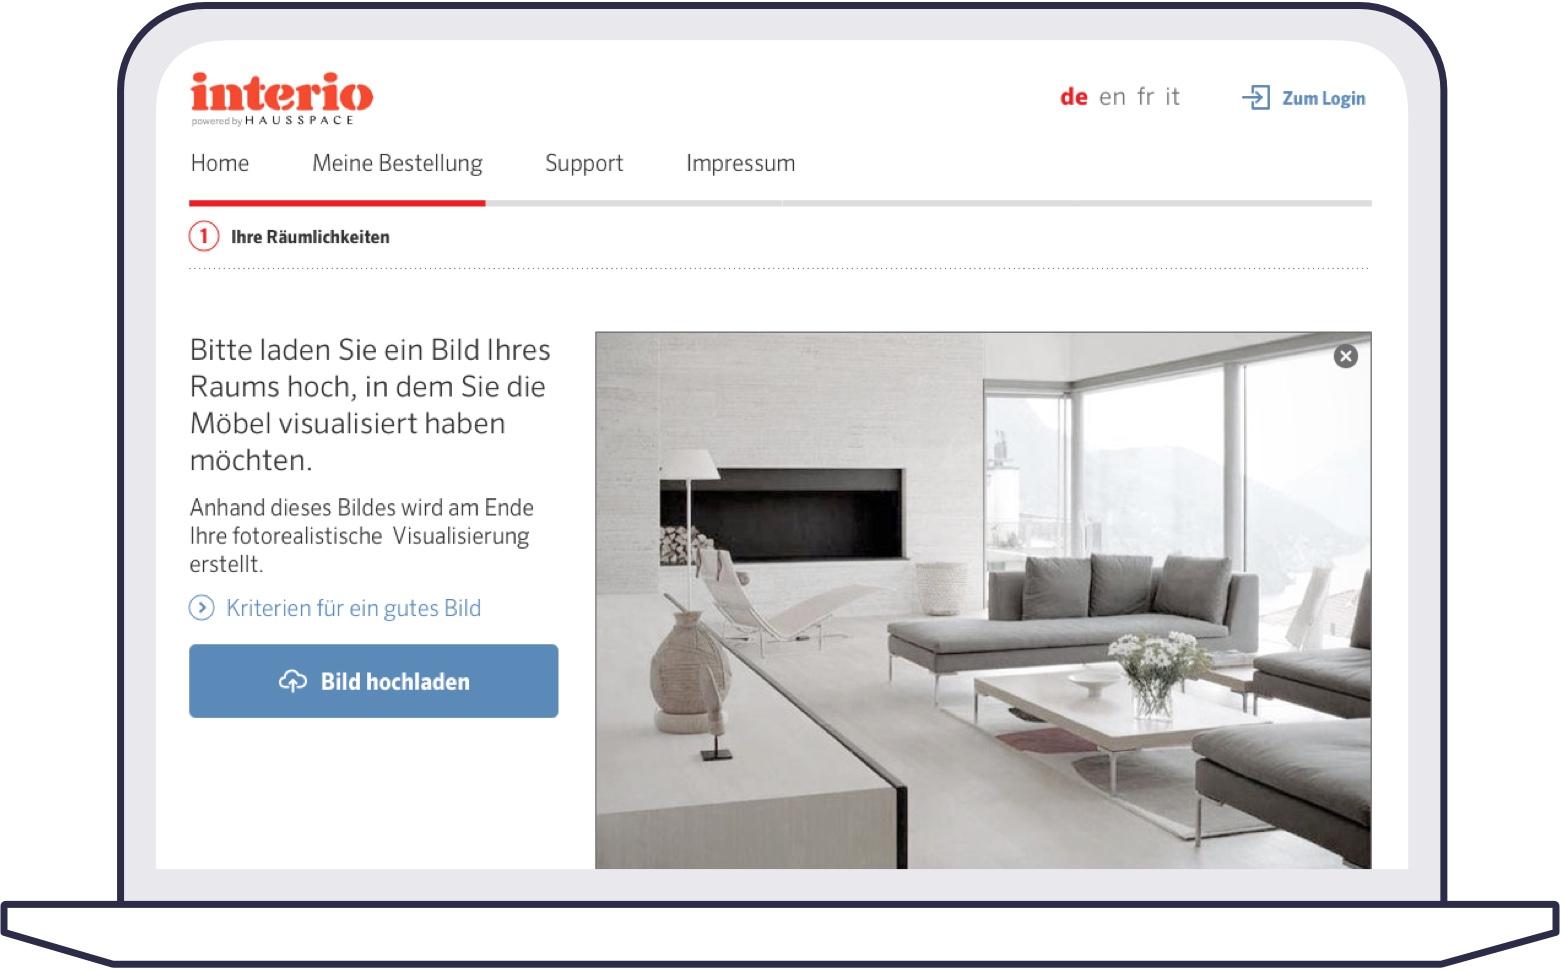 Screenshot of uploaded image of customers room